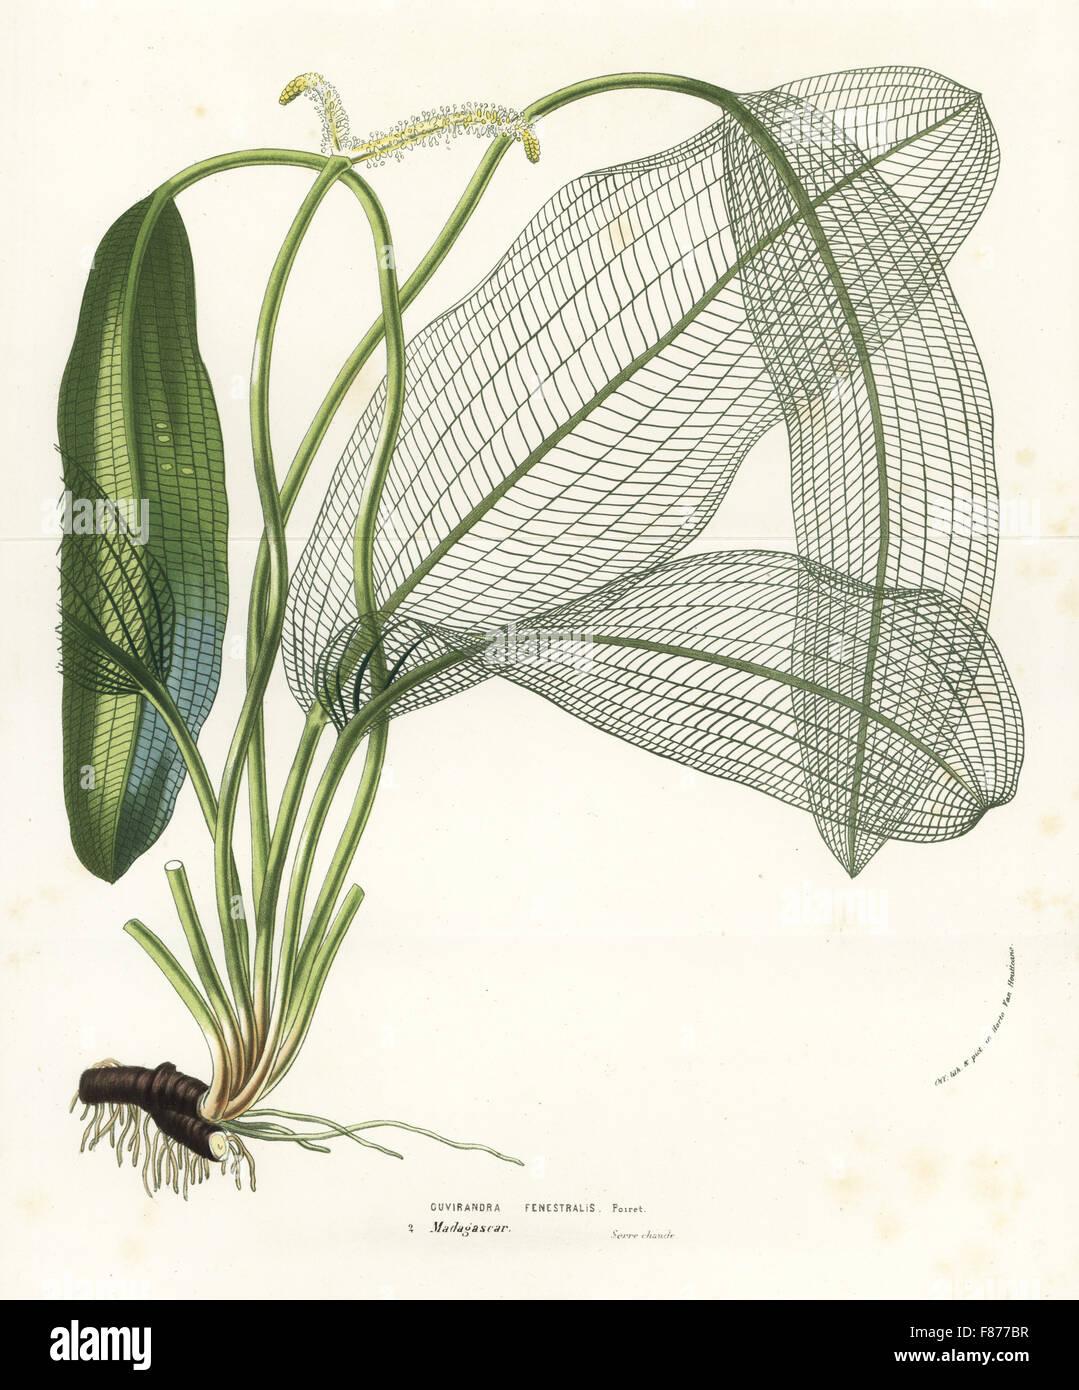 Madagascar laceleaf, lattice leaf or lace plant, Aponogeton madagascariensis (Ouvirandra fenestralis). Handcoloured - Stock Image